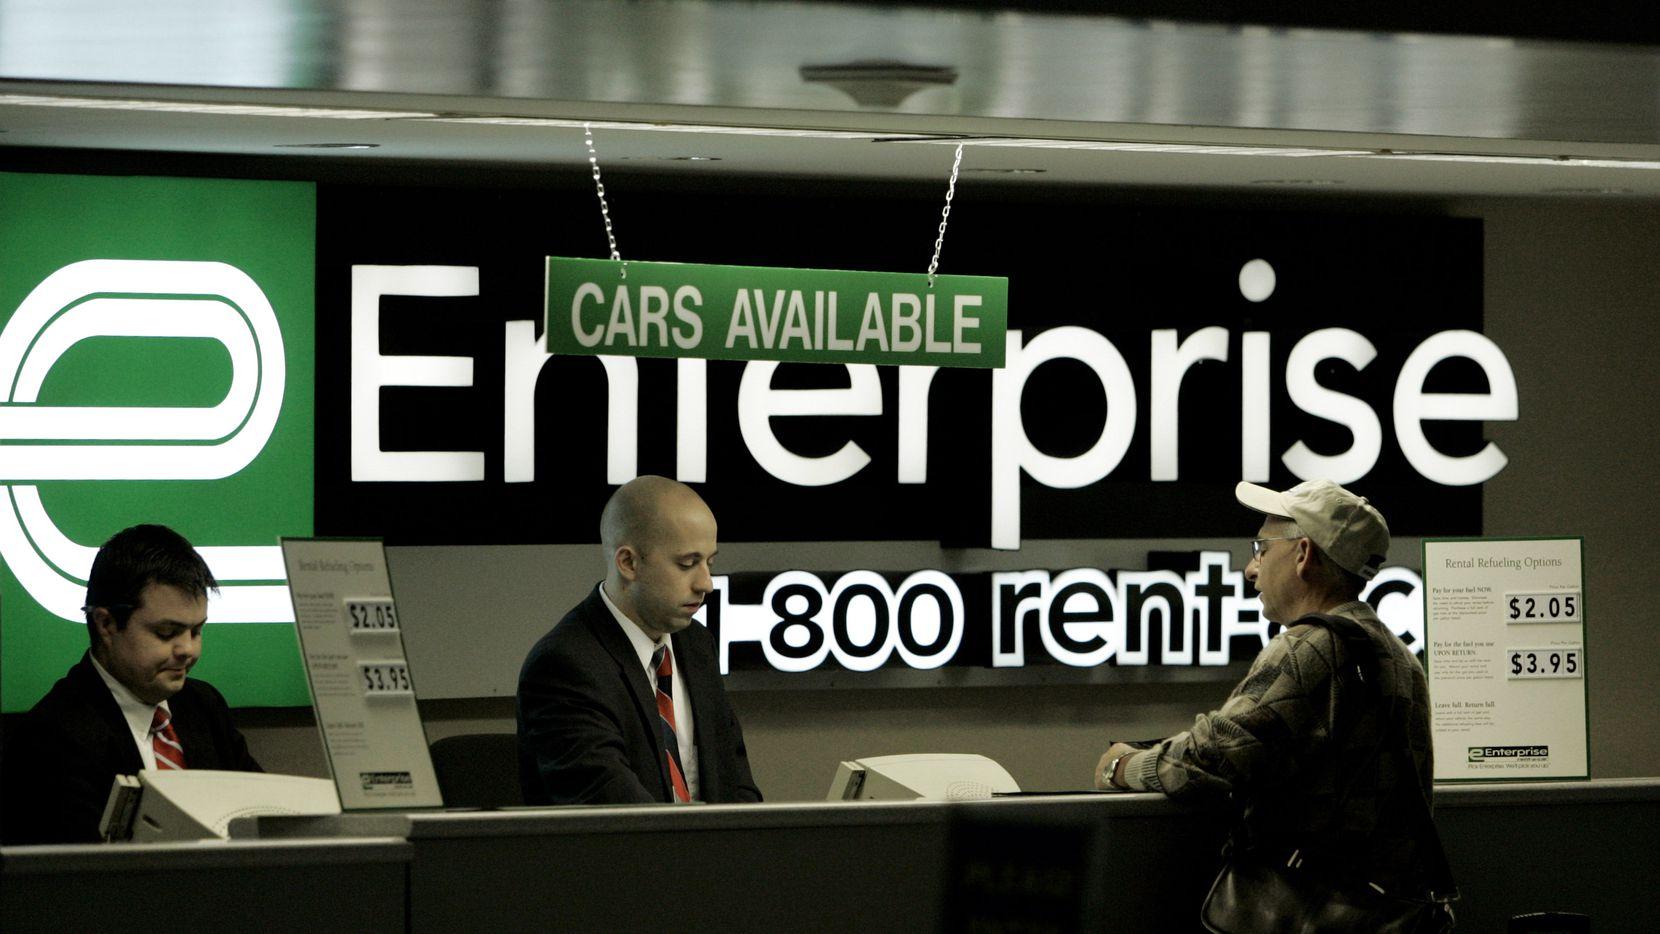 Enterprise, Alamo, National Will No Longer Give NRA